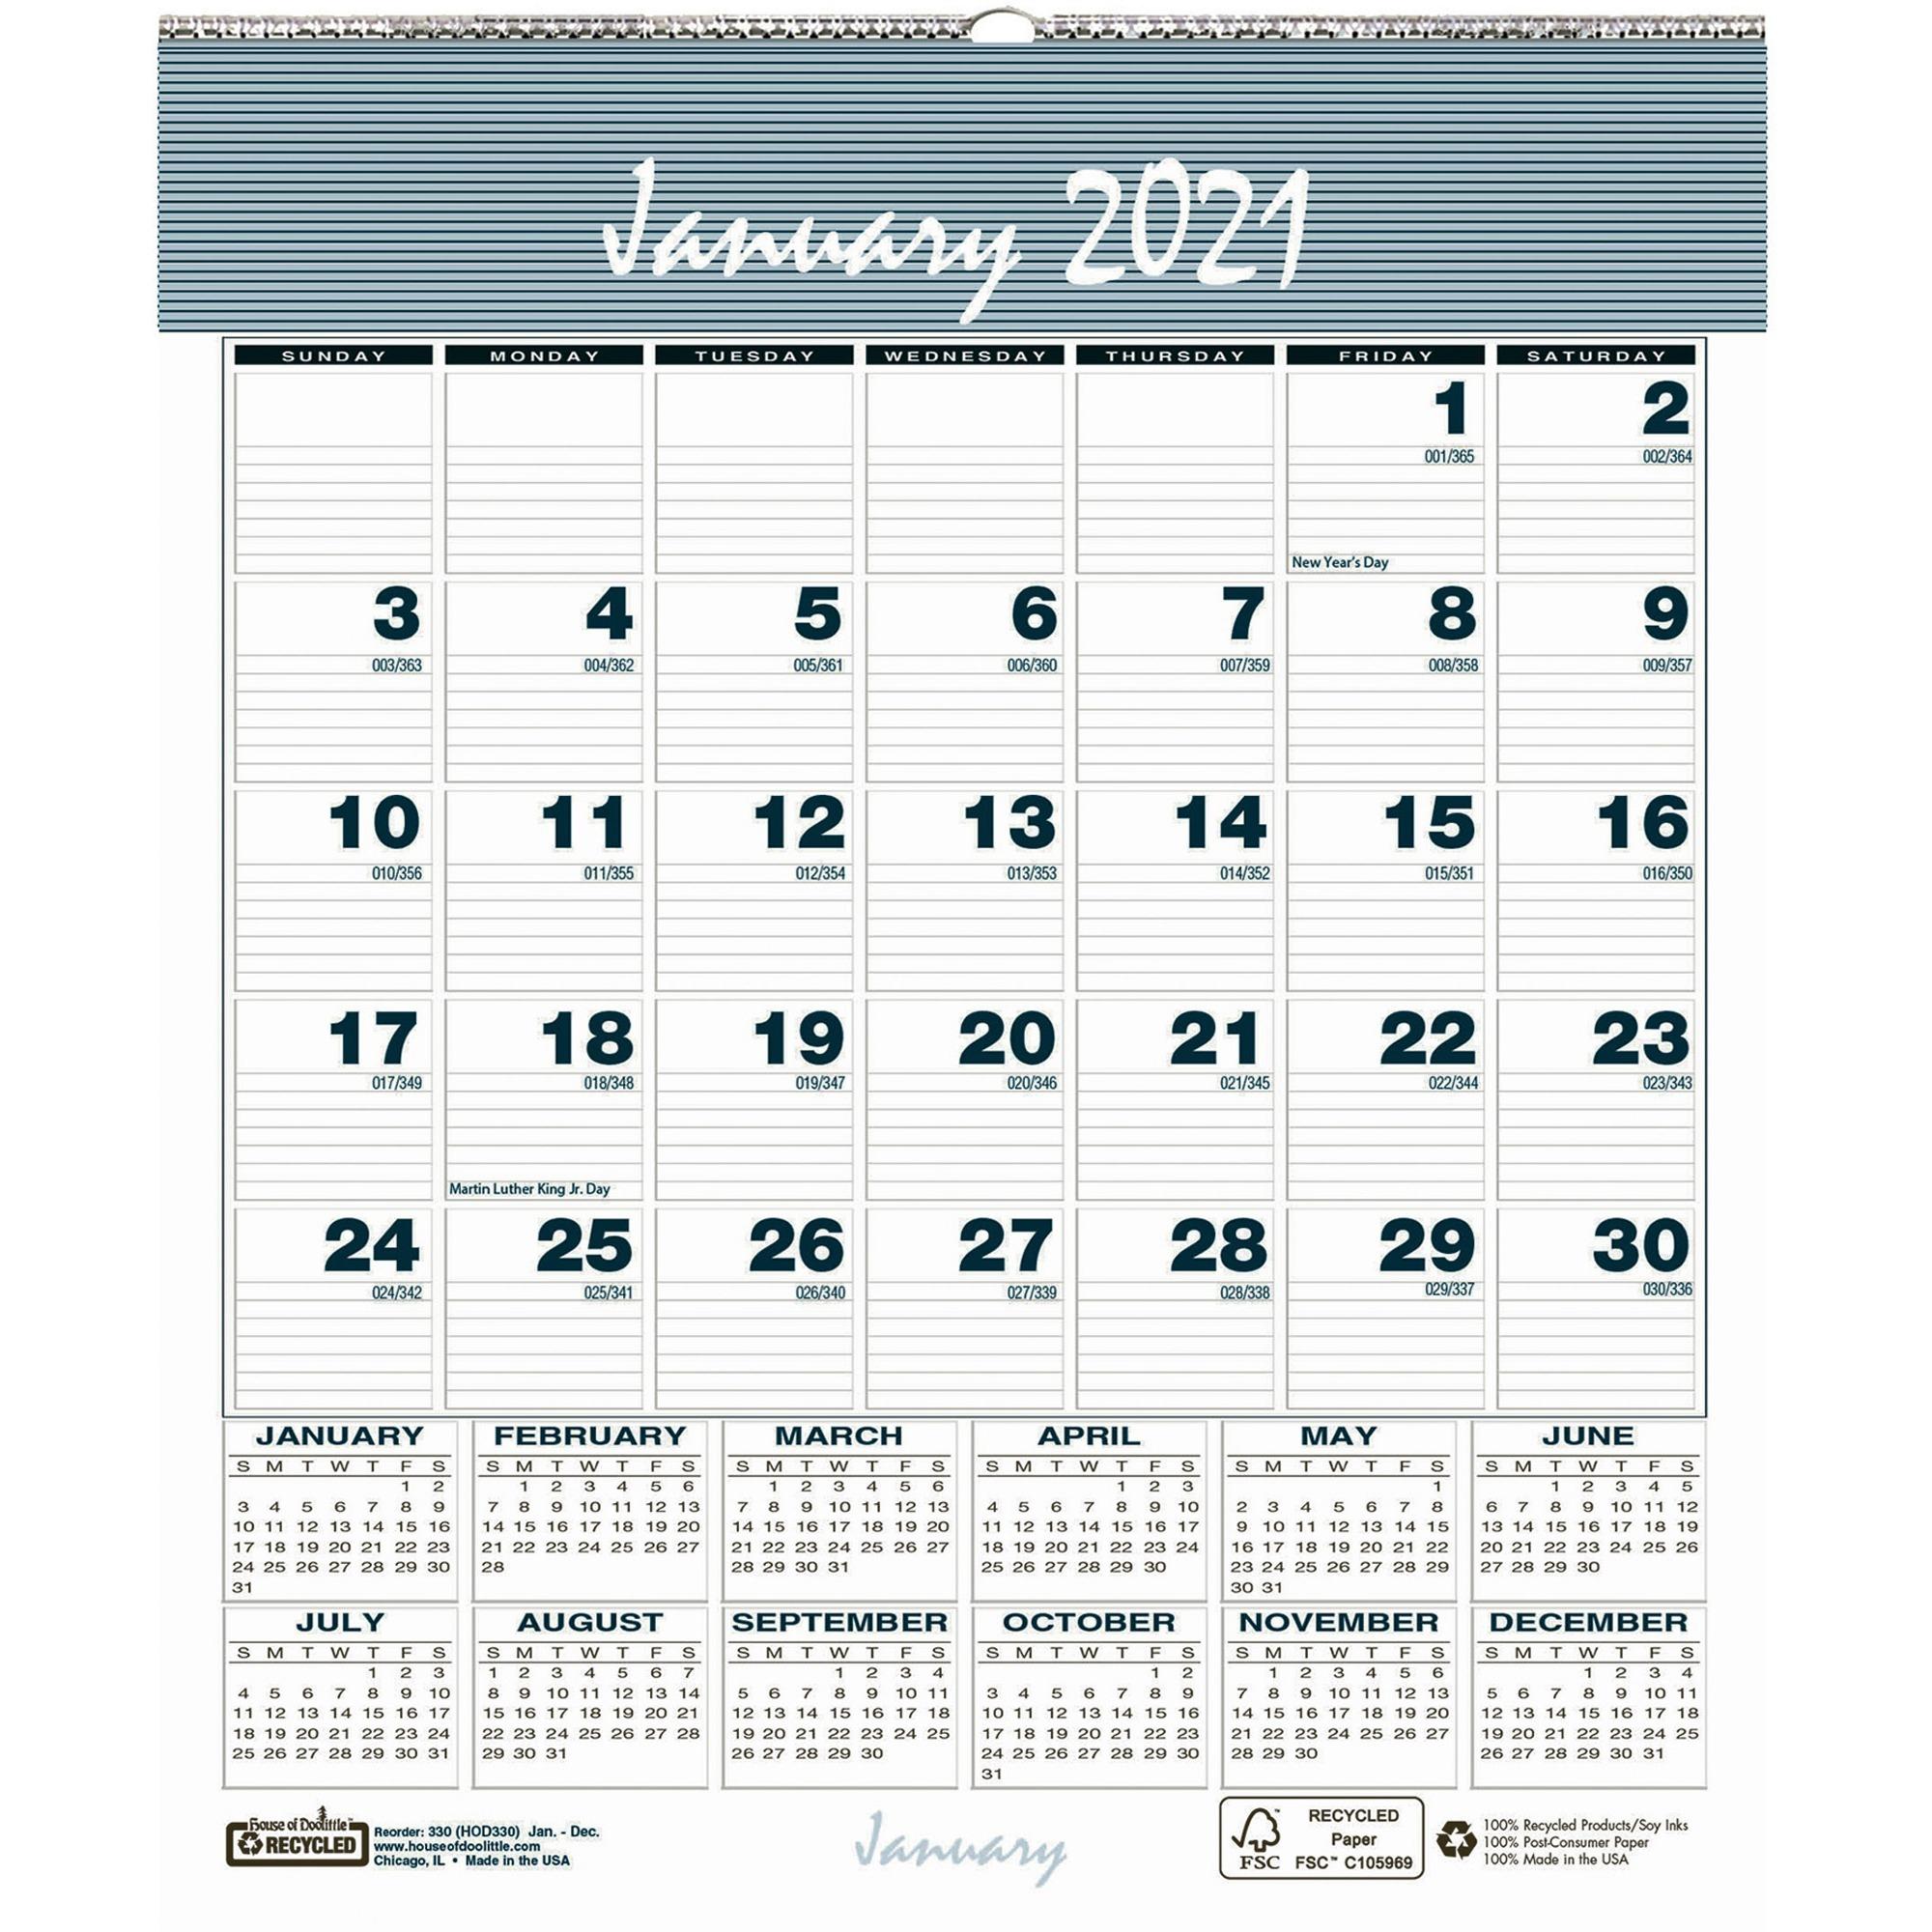 House Of Doolittle Bar Harbor Monthly Wall Calendar inside 2021 Yearly Julian Calendar